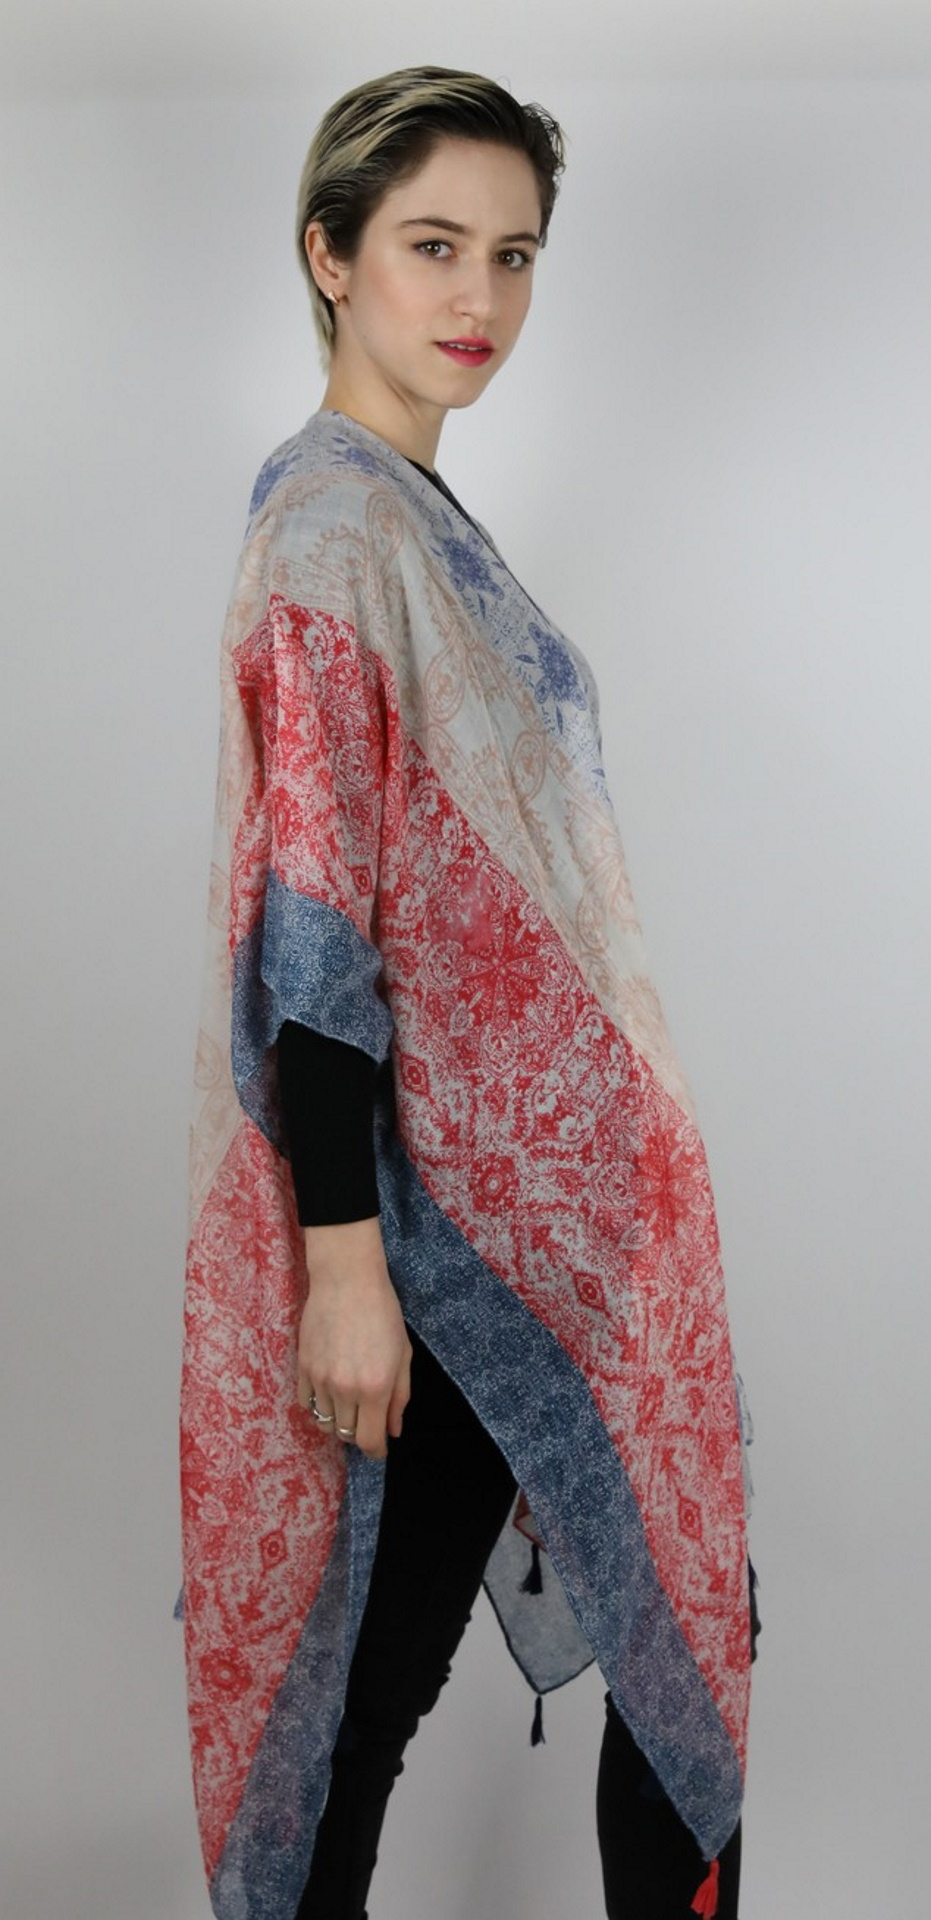 CLOTHES14 STOLA DONNA FOULARD CARDIGAN COPRISPALLE 3 1stAmerican elegante stola da donna foulard cardigan coprispalle